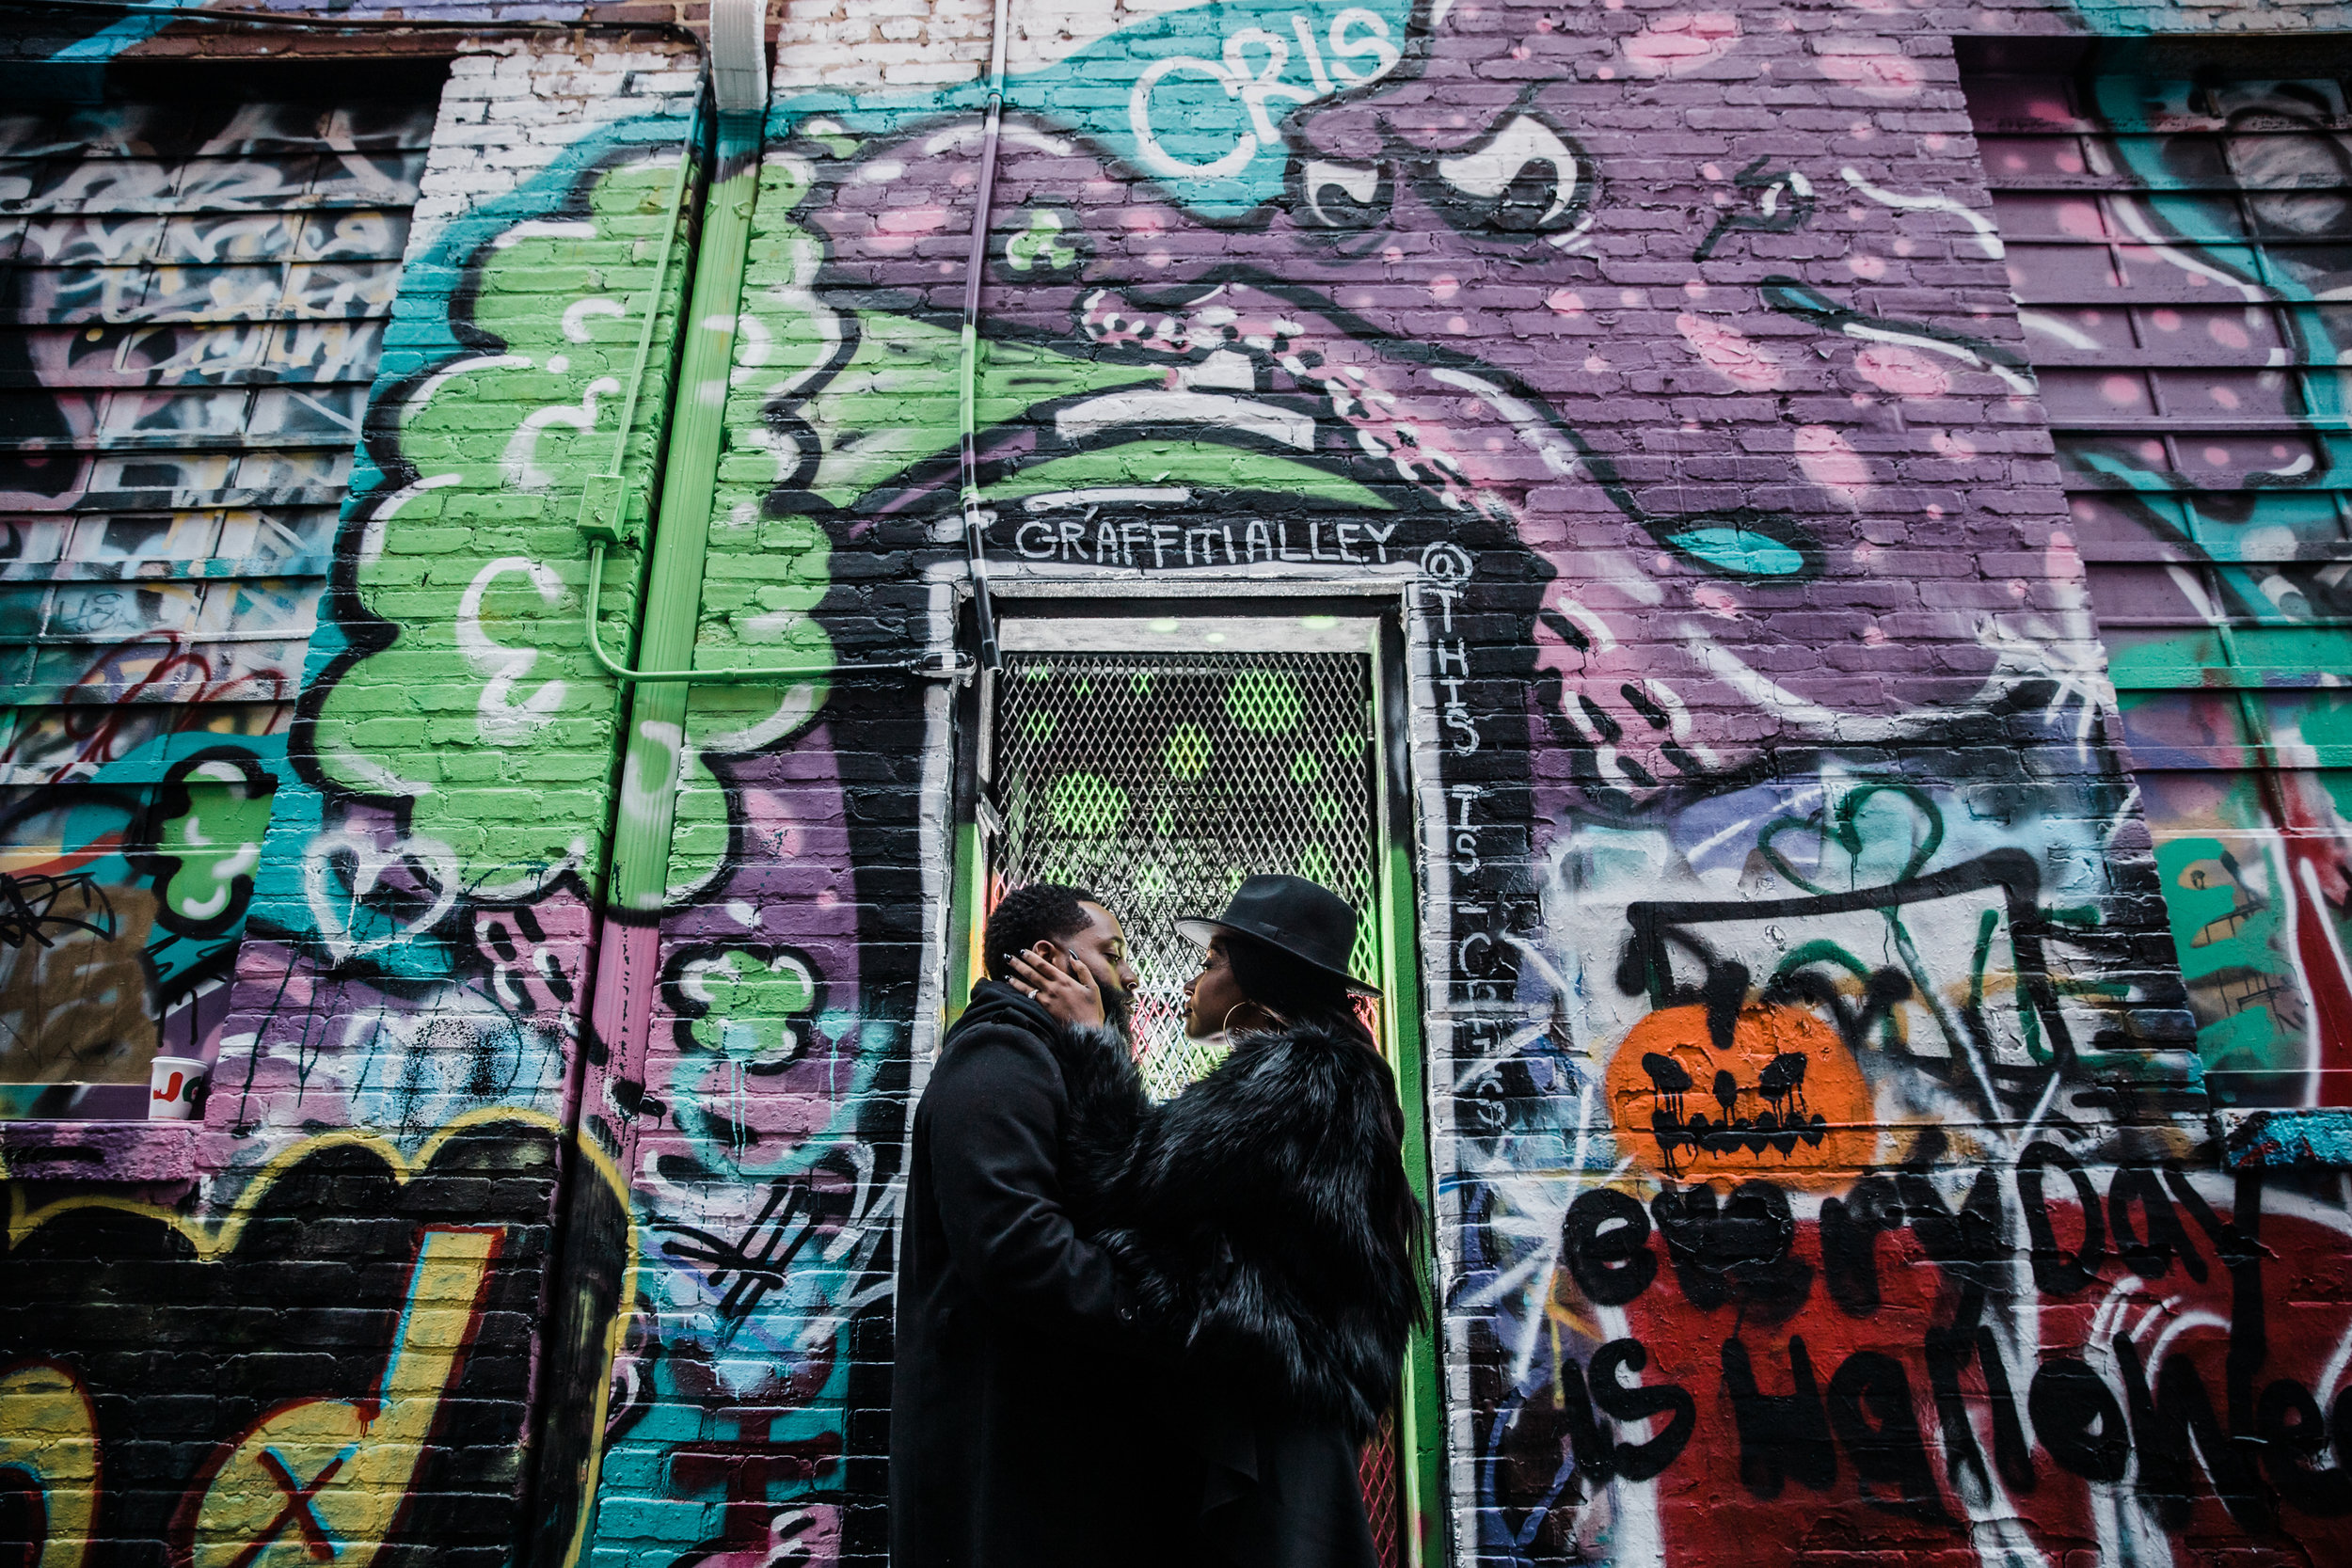 Creative Baltimore Graffiti Alley Engagement Session Megapixels Media Photography-46.jpg